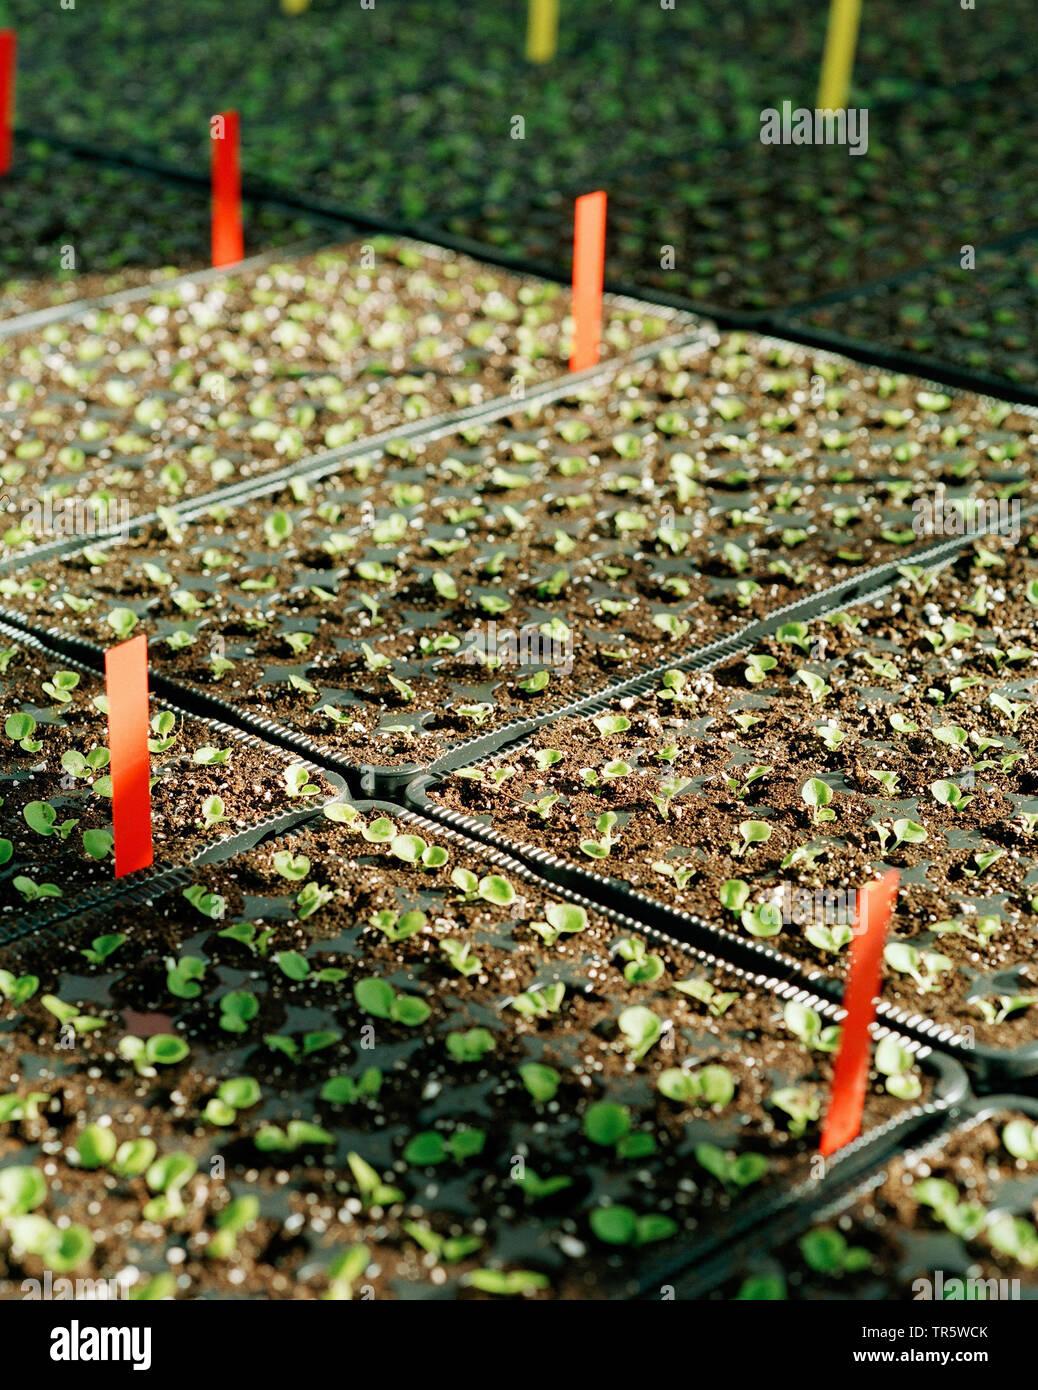 Ansaaten in einem Gewaechshaus einer Gaertnerei, Deutschland | greenhouse with seedlings in a nursery, Germany | BLWS466583.jpg [ (c) blickwinkel/C. K - Stock Image